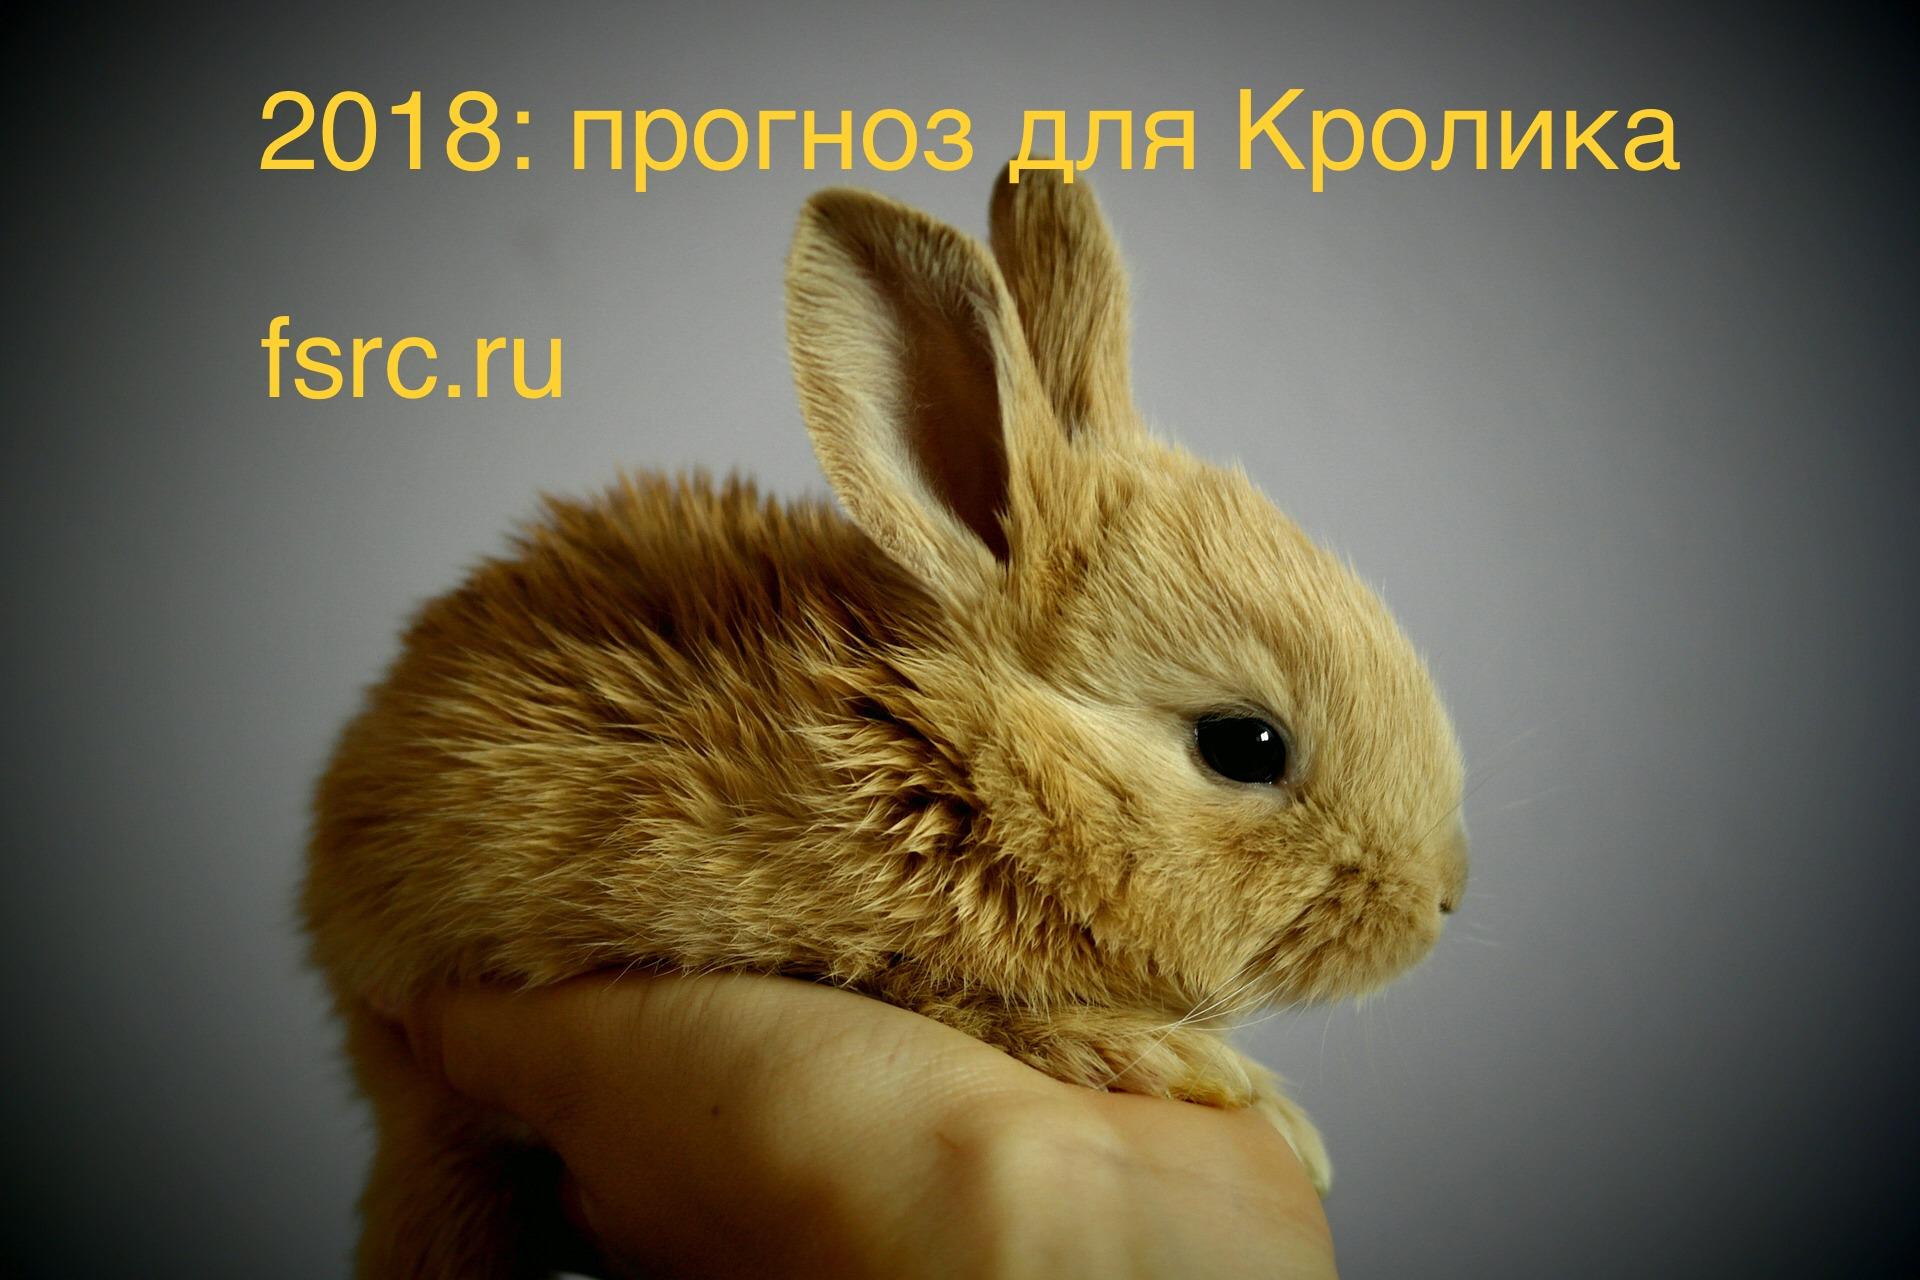 2018 Прогноз для Кролика - Fengshuimaster.ru